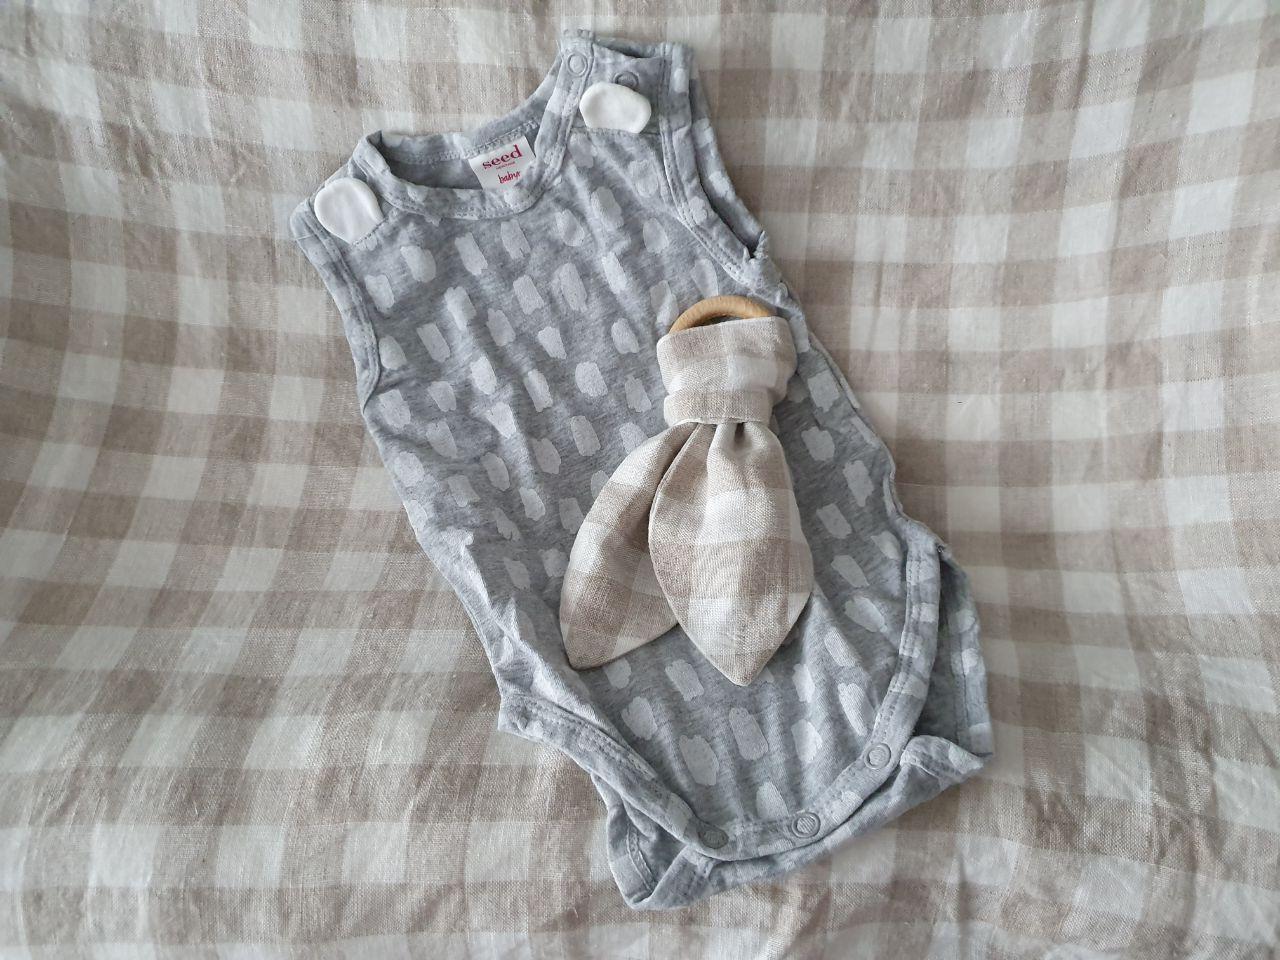 Pregnant during covid19 - newborn clothes saving money